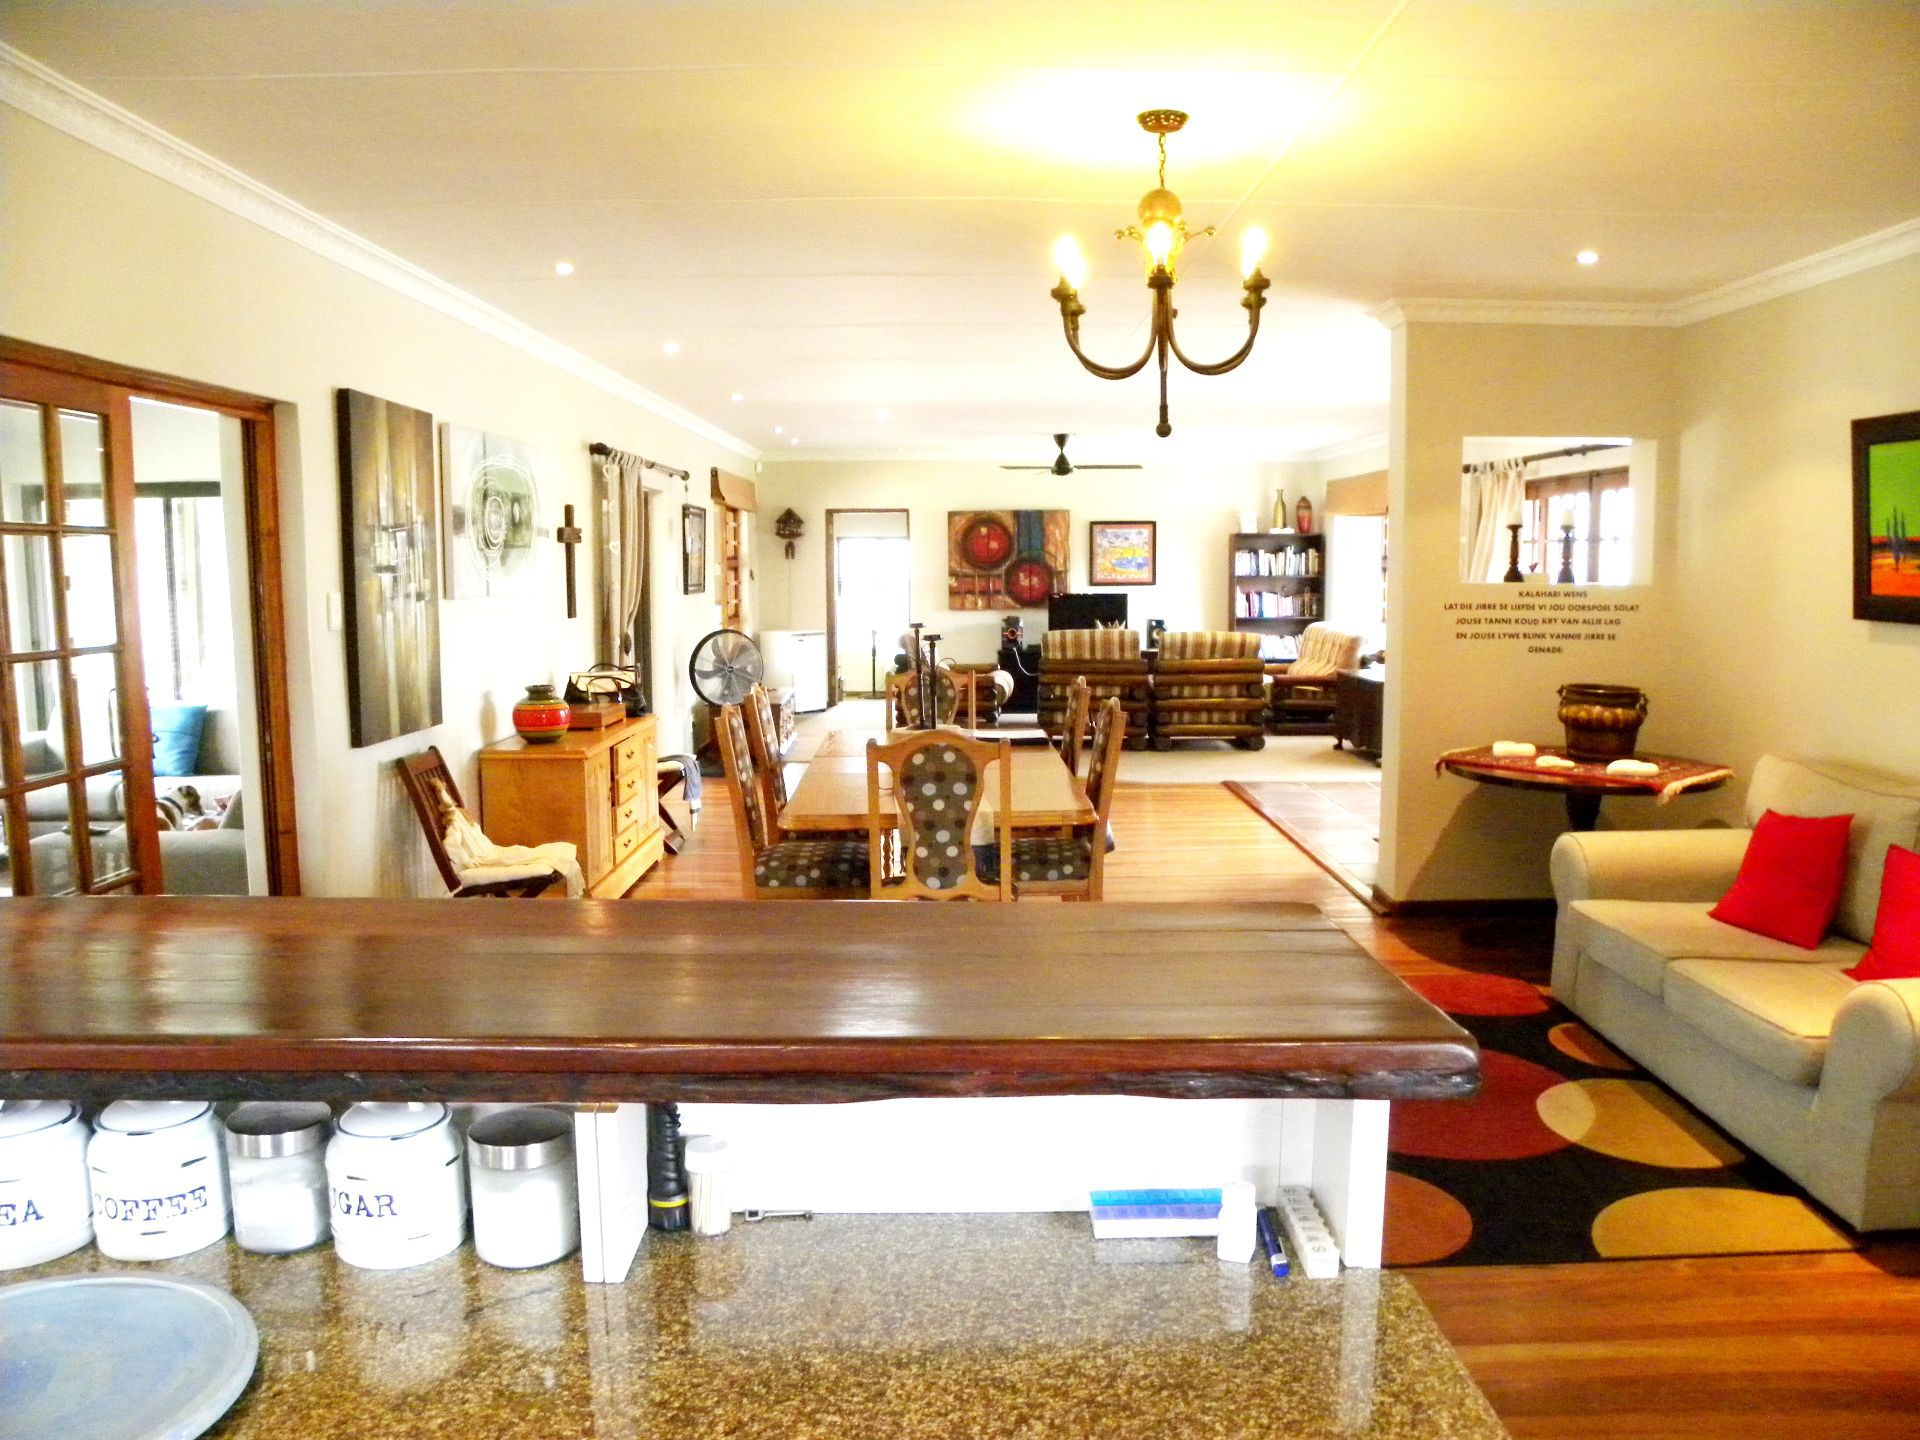 Bonnie Doone property for sale. Ref No: 13553551. Picture no 5